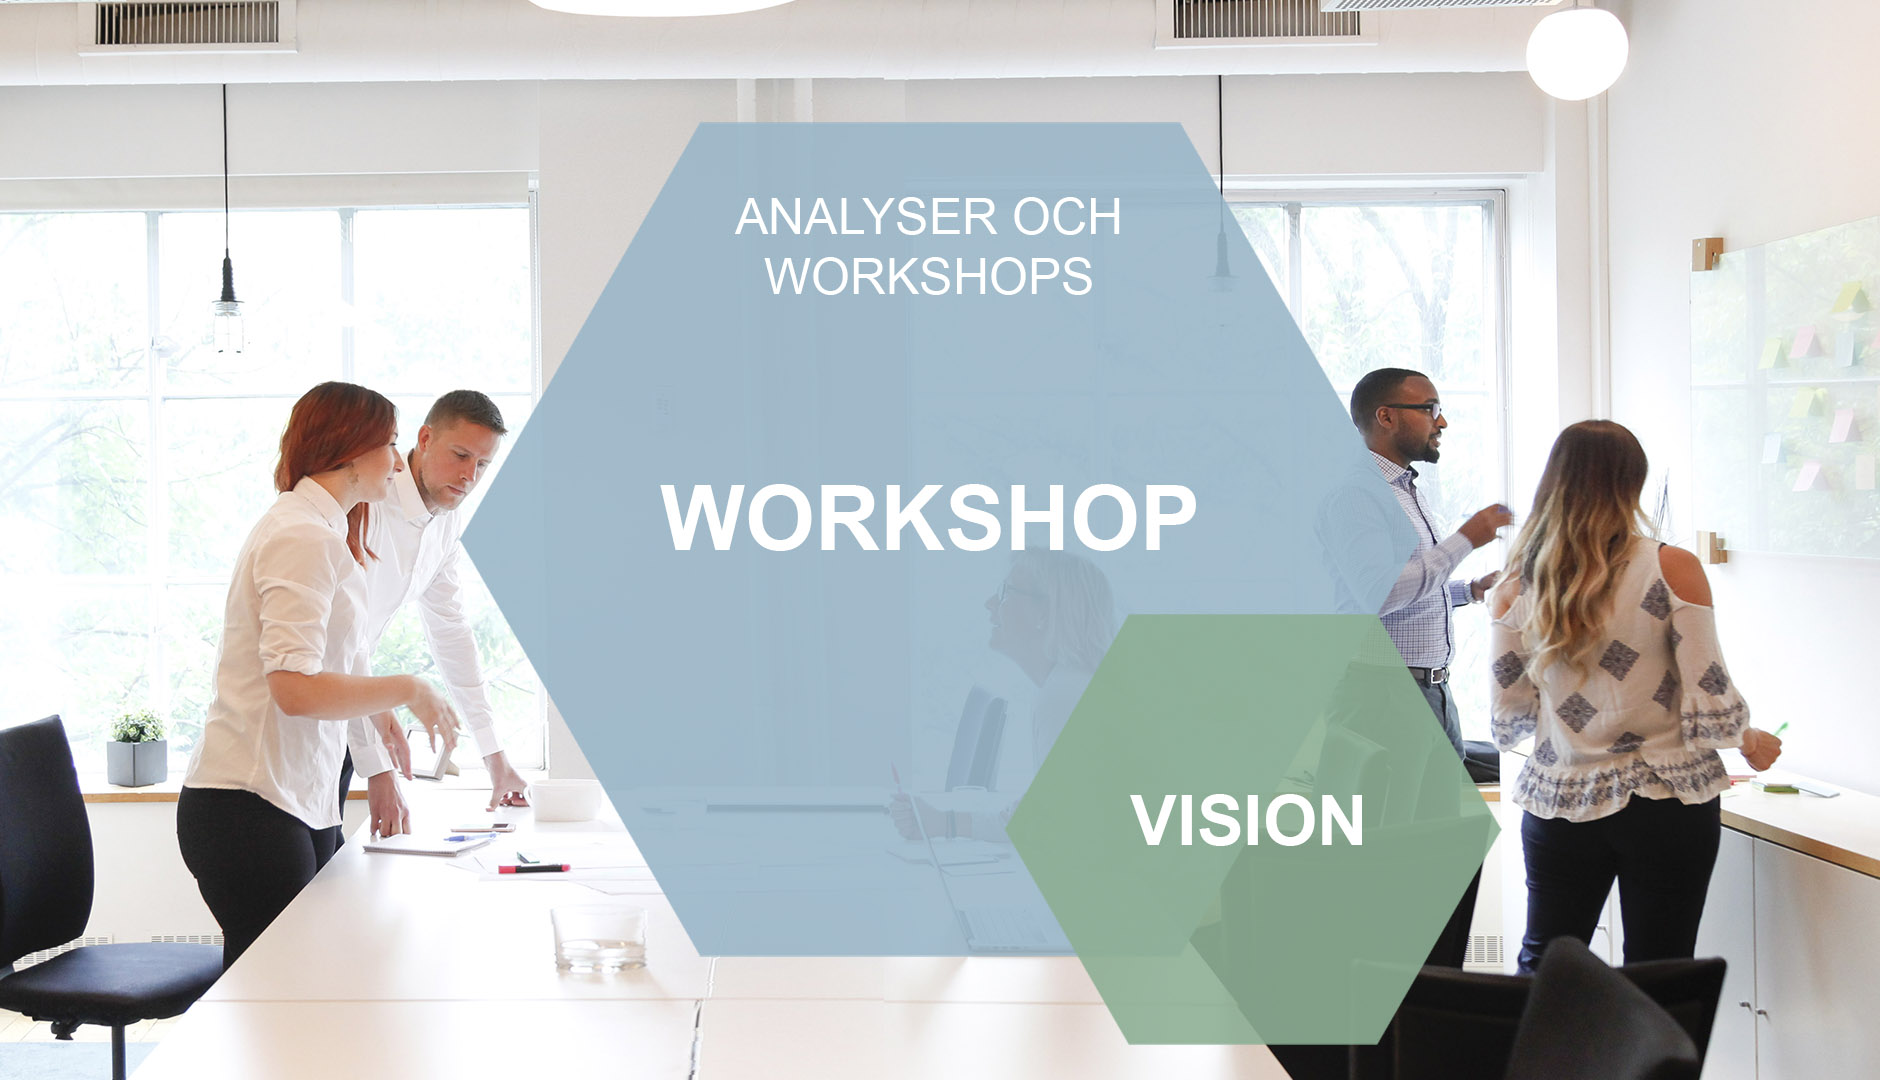 Vision workshop i hexagon mot bakgrund av människor som workshoppar